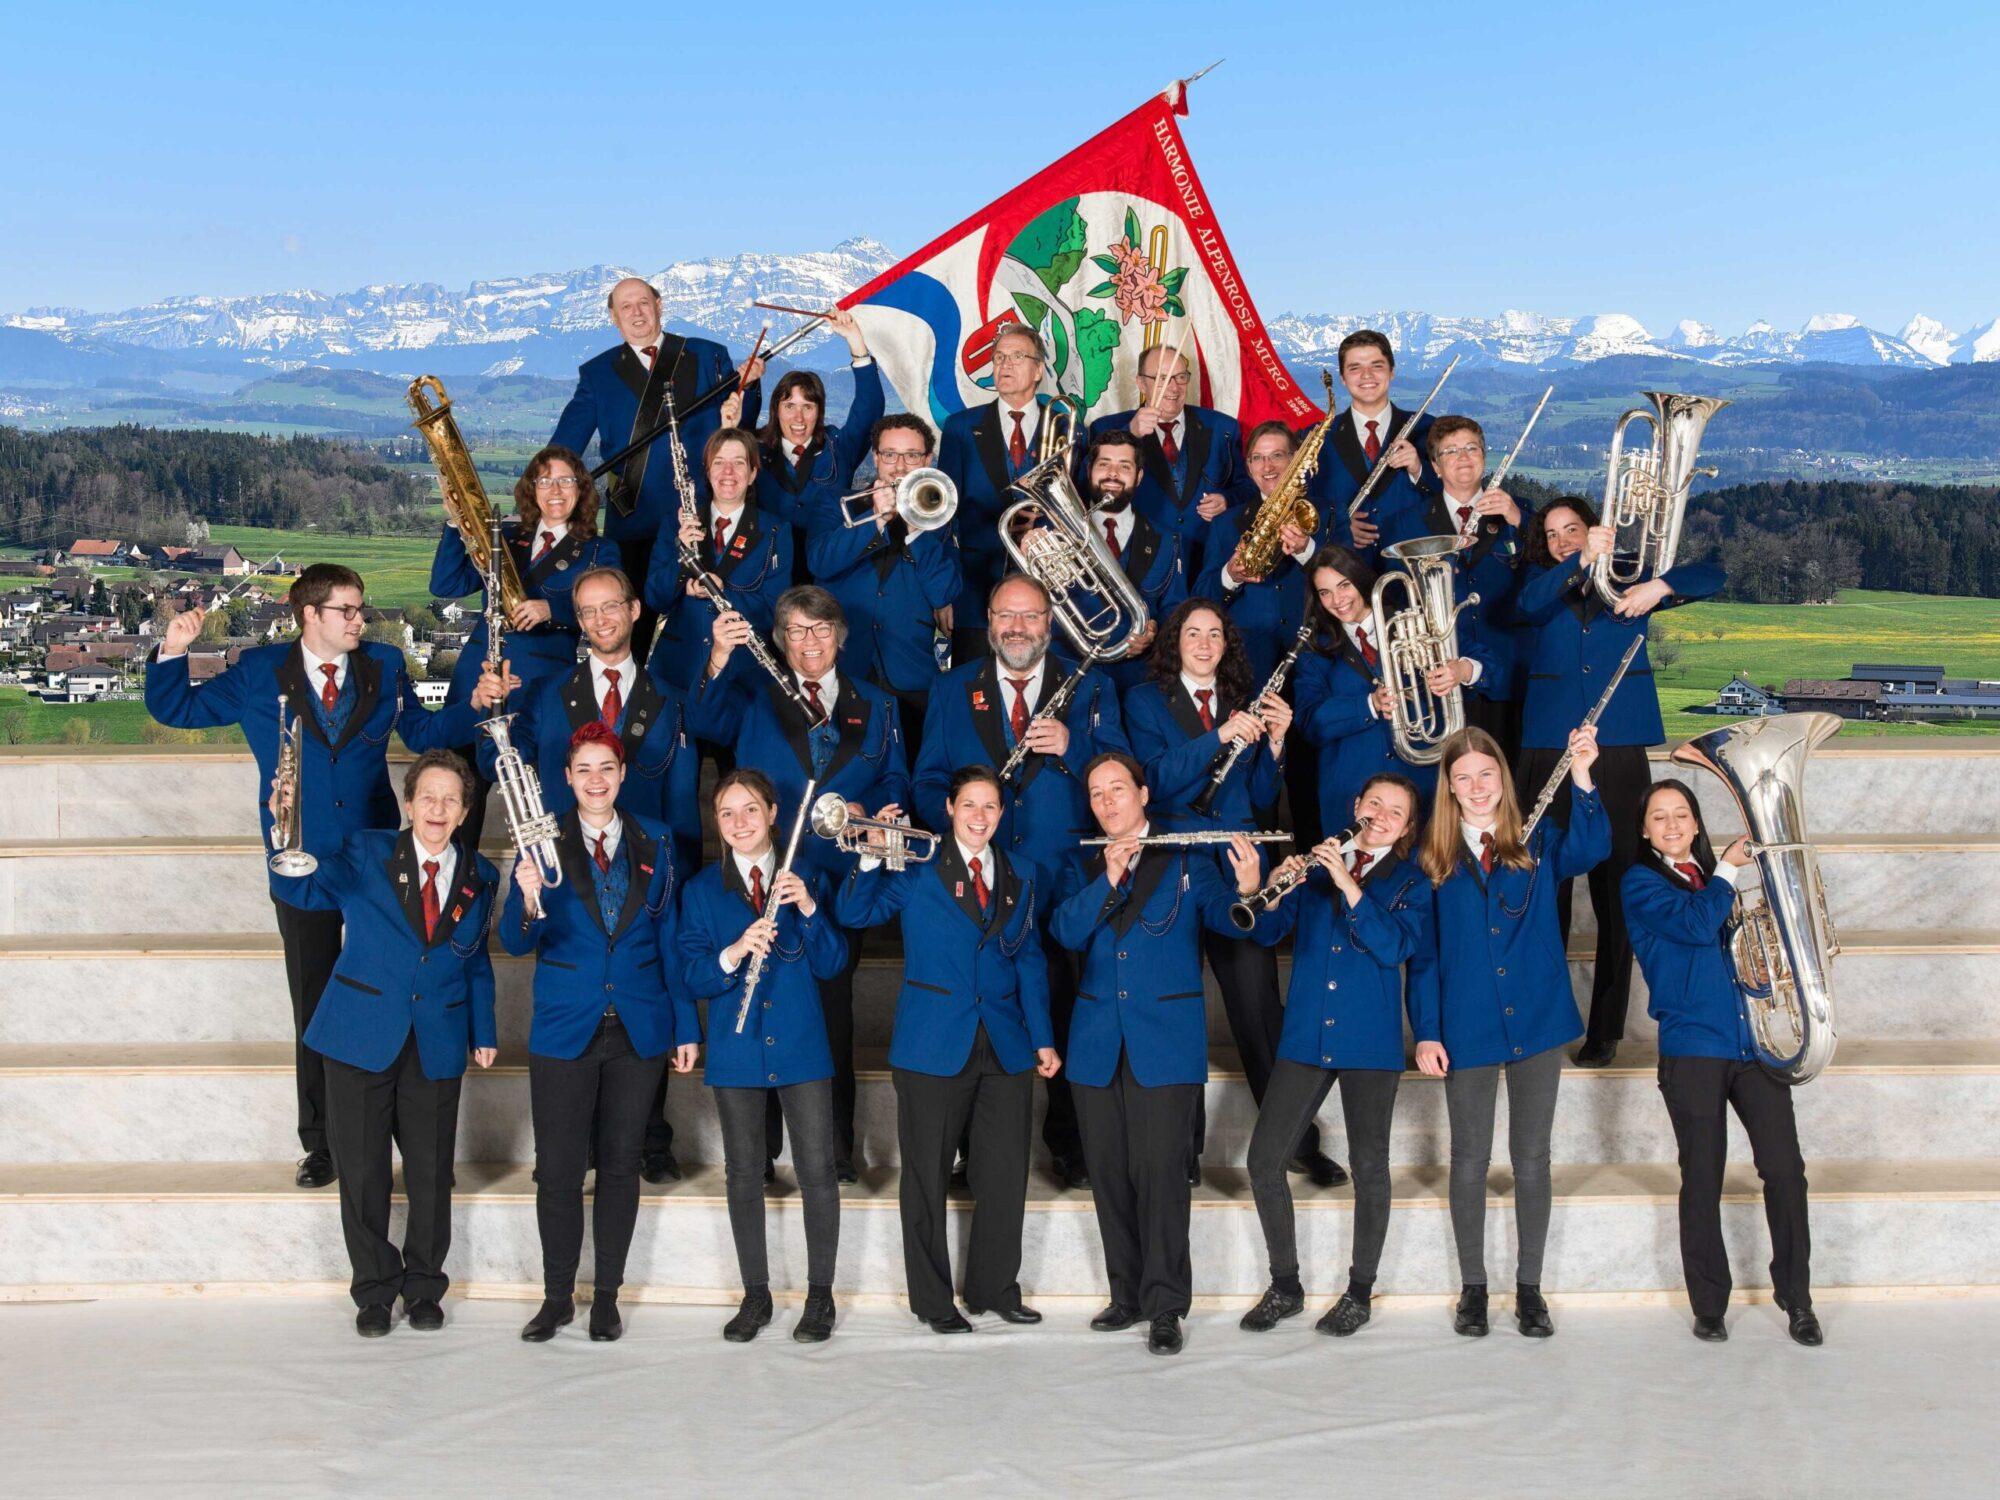 Harmonie Alpenrose Murg